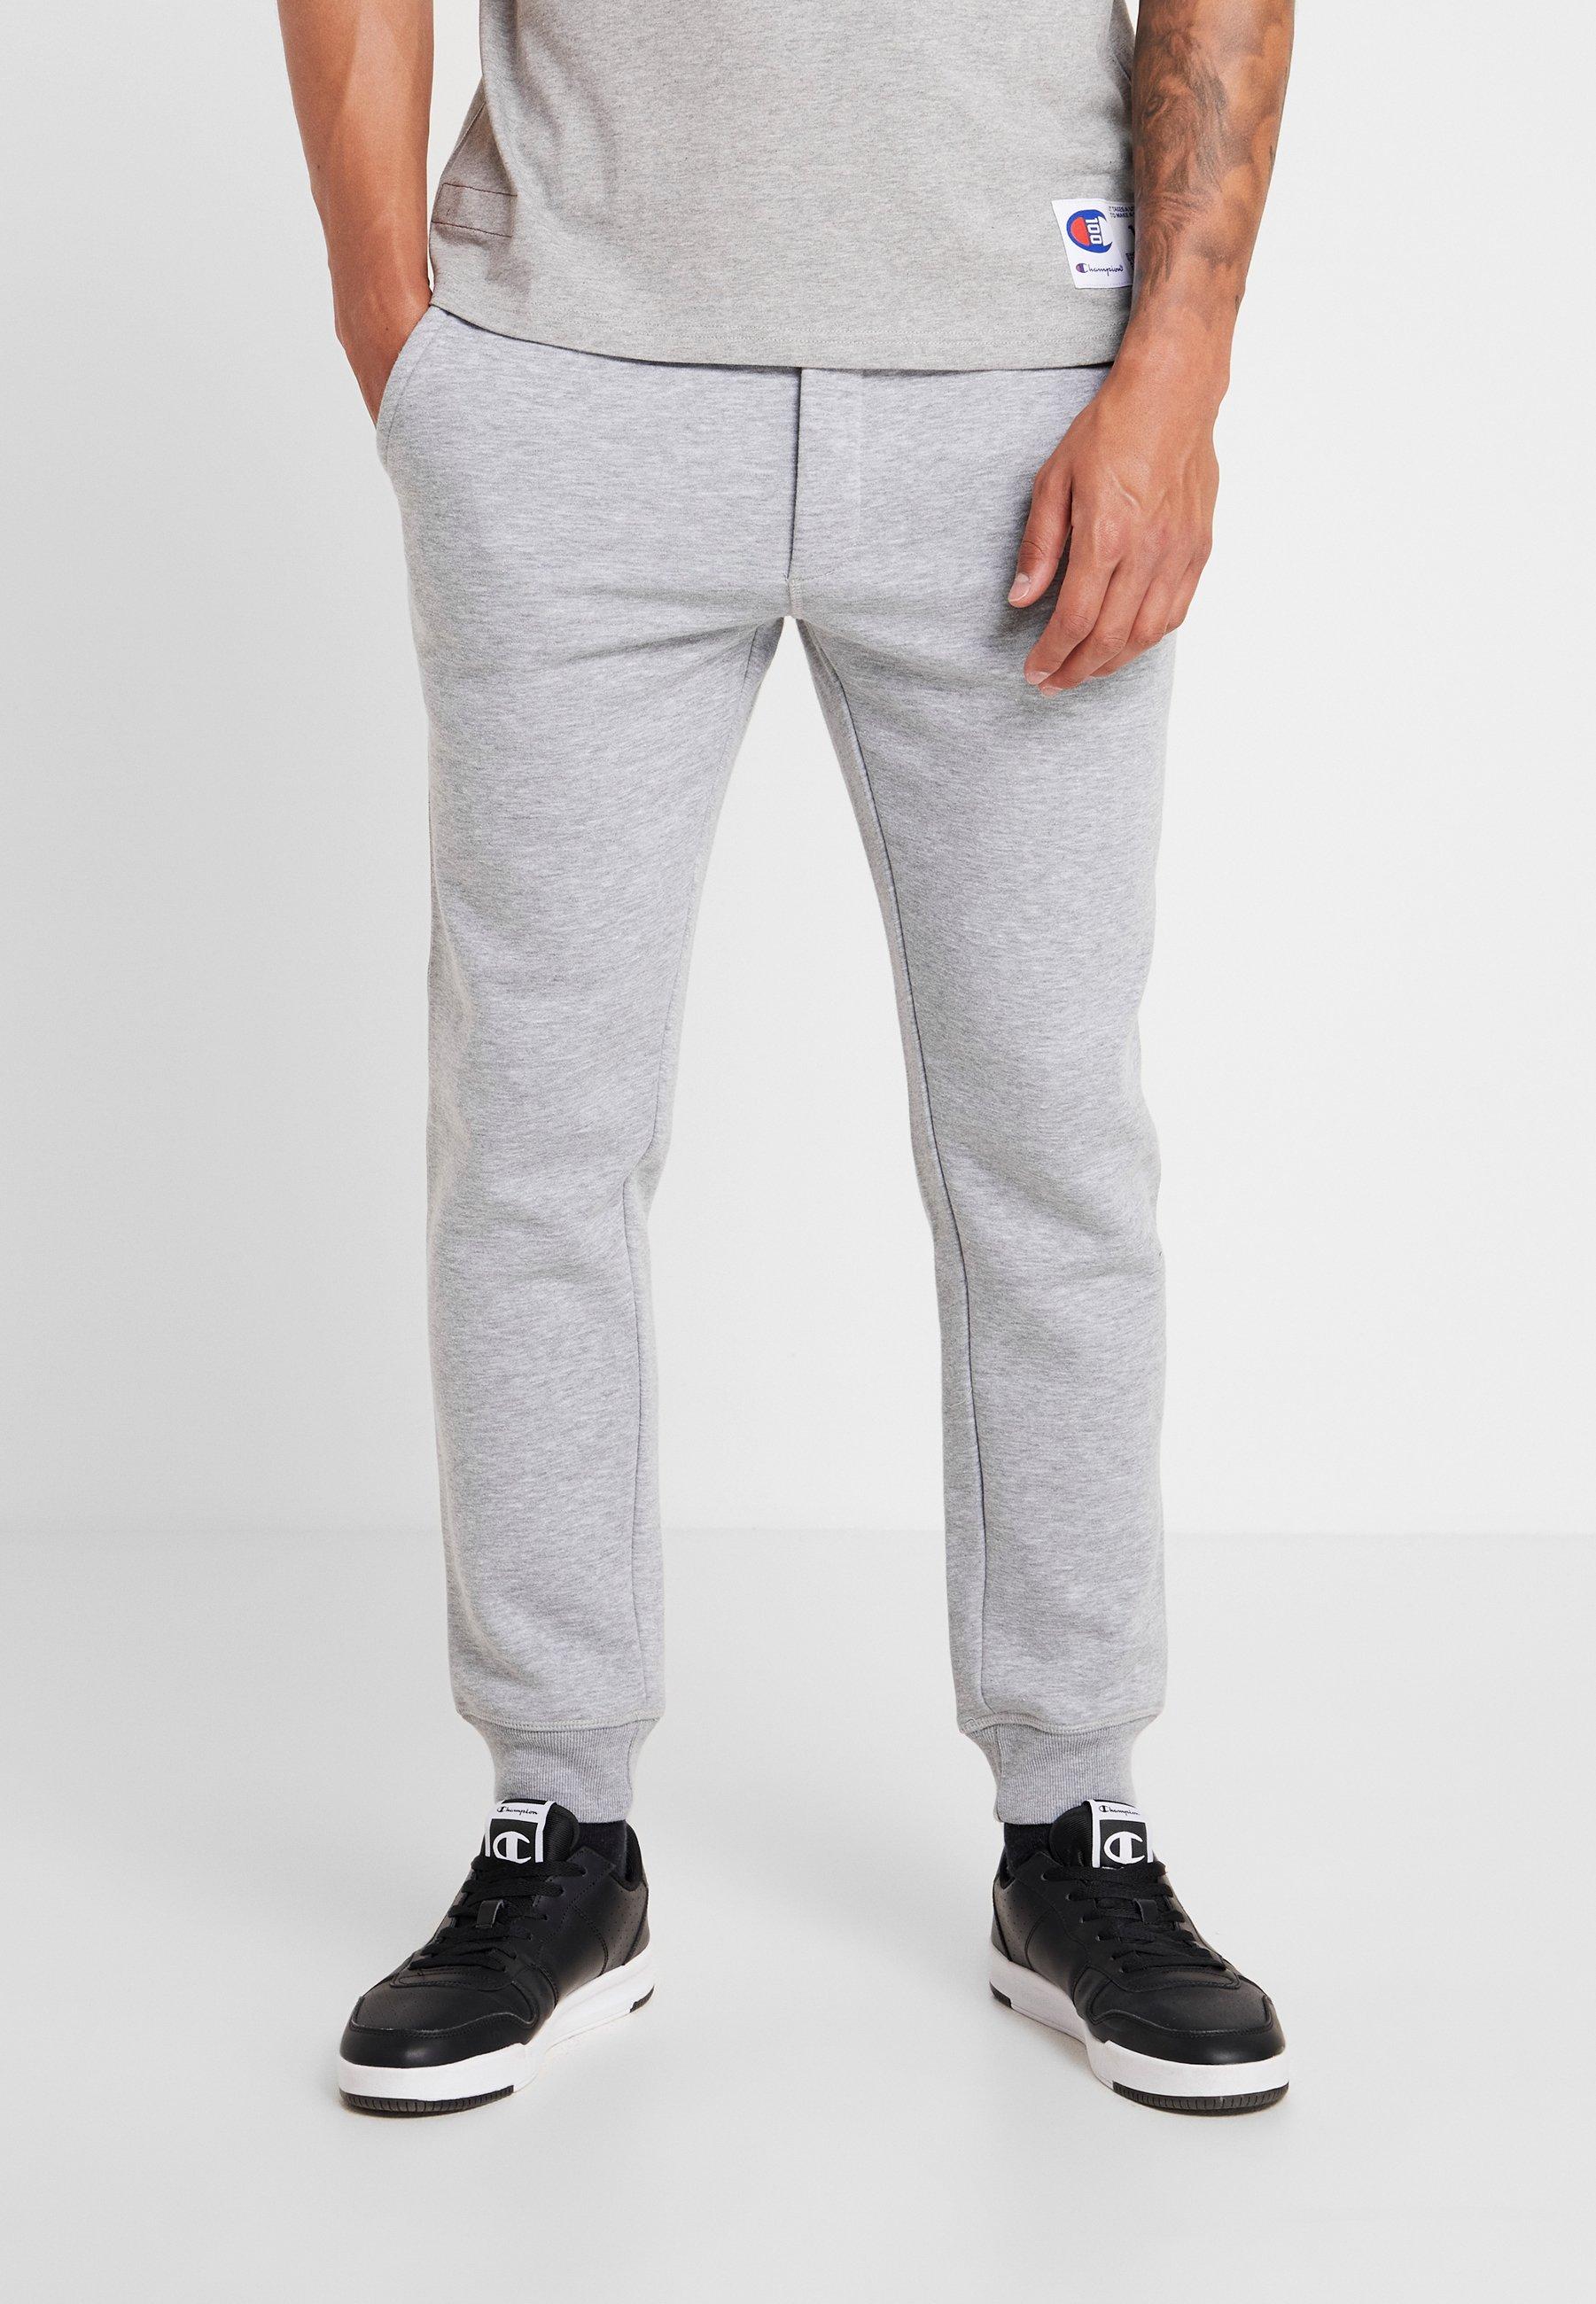 PantsPantalon De Soft Grey Survêtement Jackamp; Jones Jjigordon Light Melange CdQrBoexW